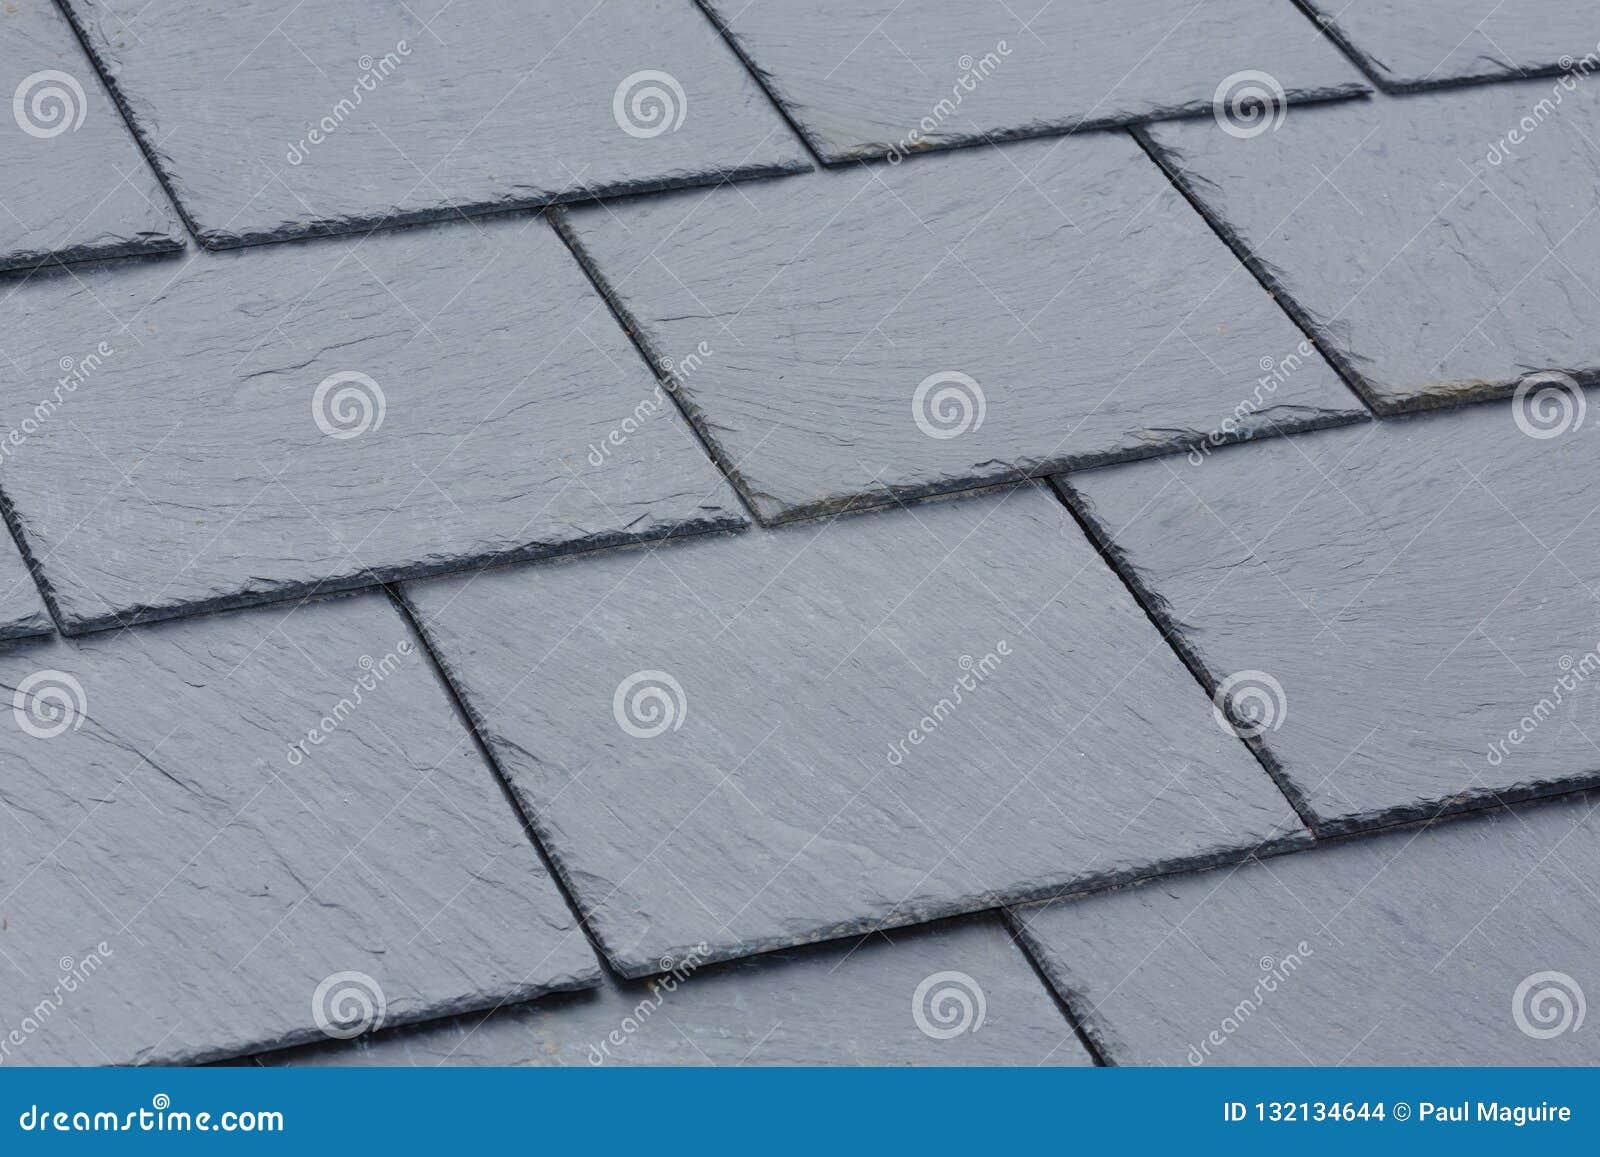 Slate roof tiles stock photo  Image of backgrounds